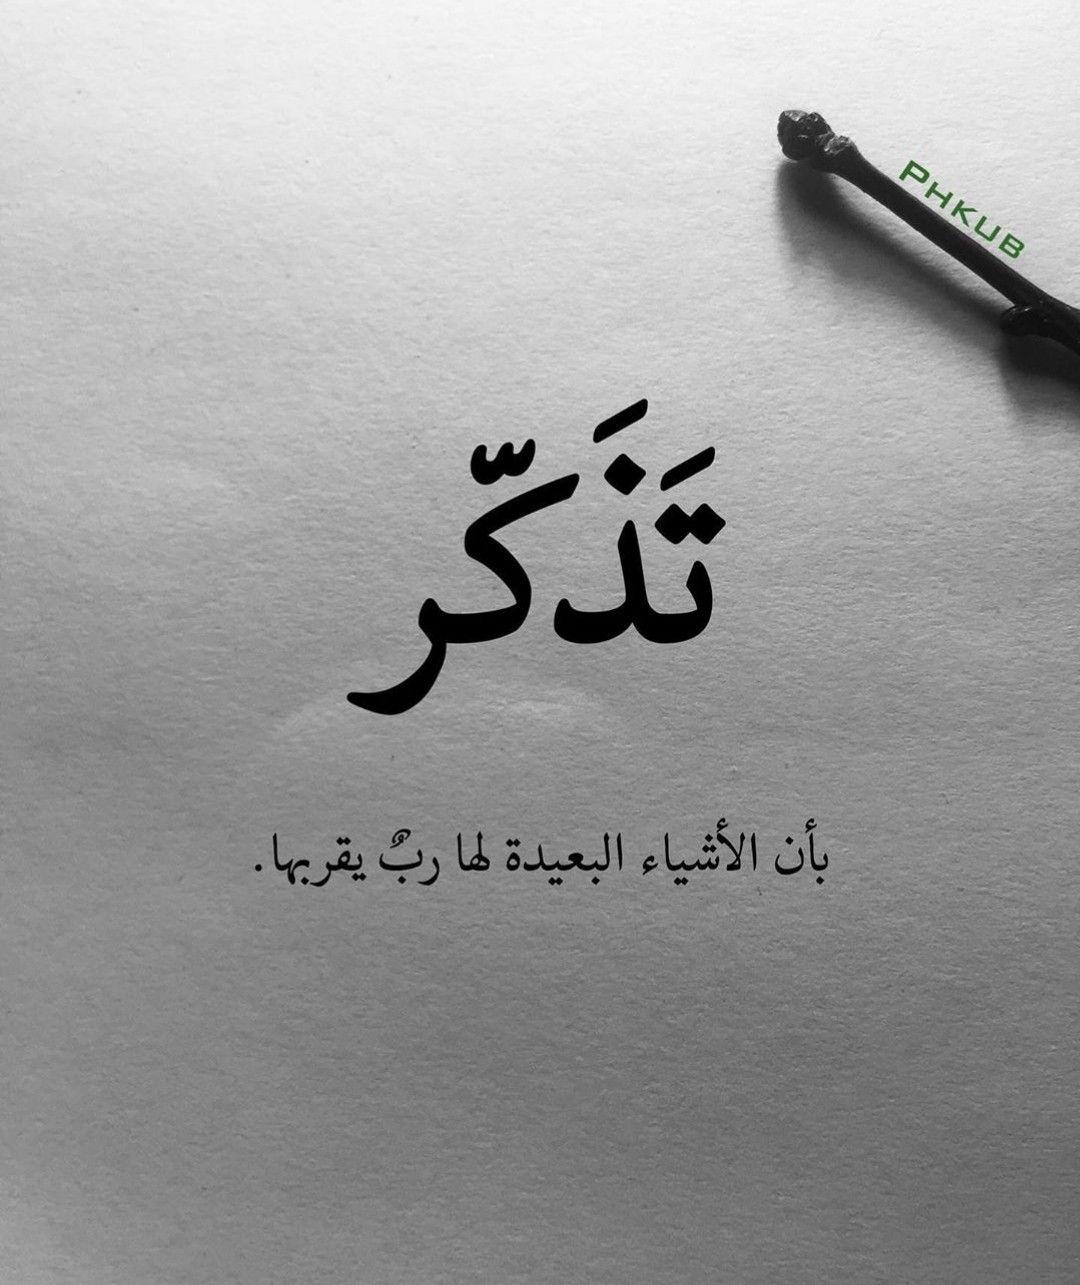 Pin By ليدي On تأمل Arabic Love Quotes Love Quotes Arabic Quotes